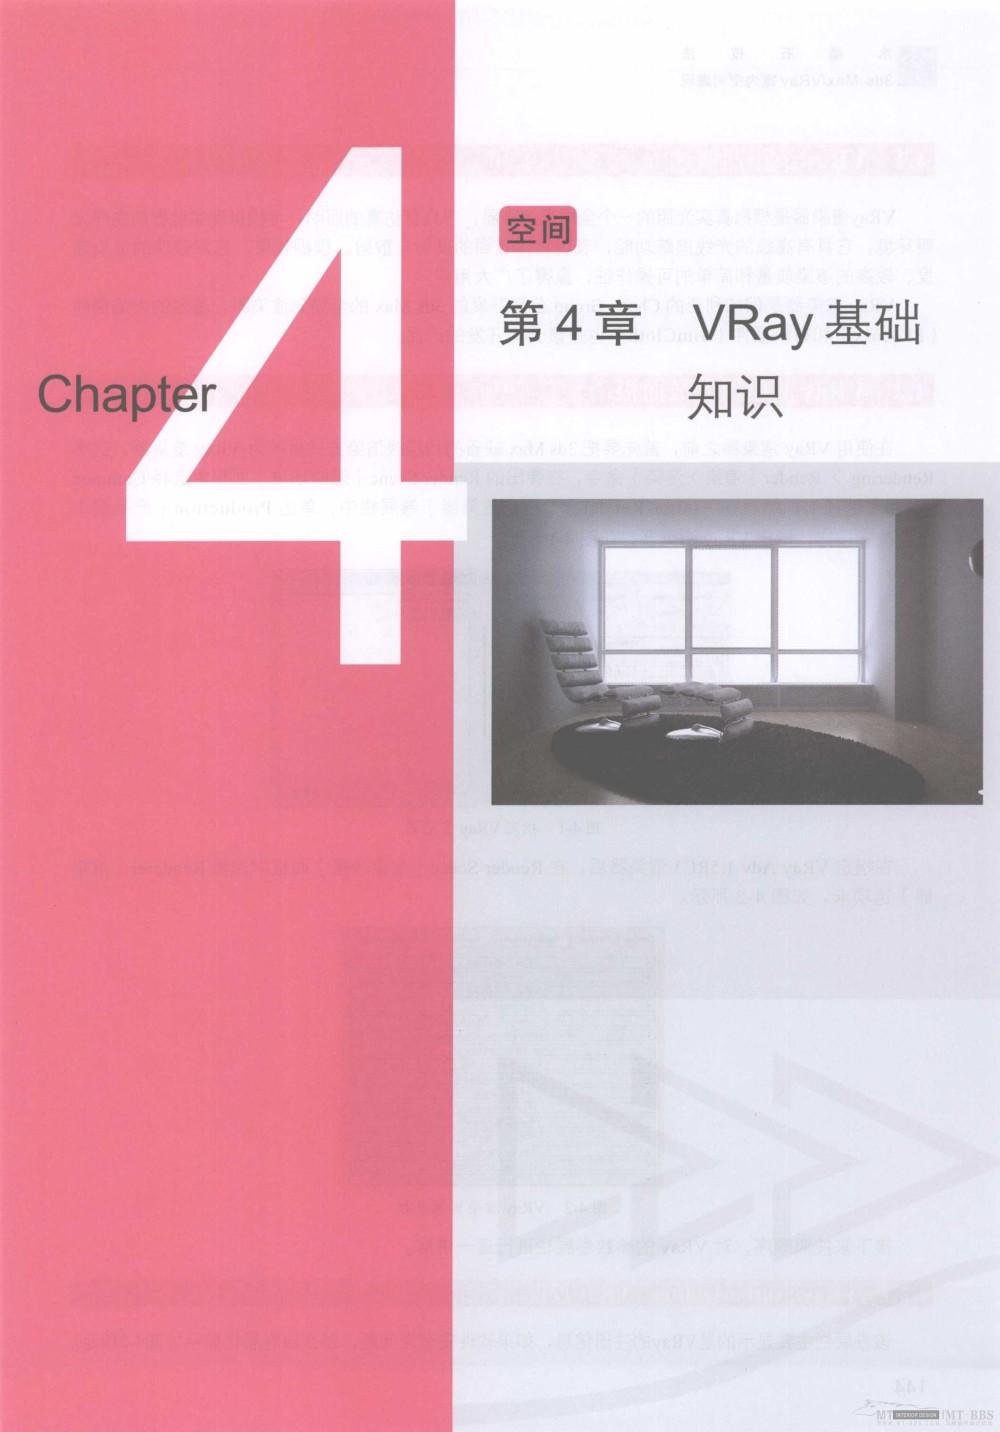 水晶石技法-3ds_Max&VRay室内空间表现_水晶石技法-3ds_Max&VRay室内空间表现_页面_149.jpg